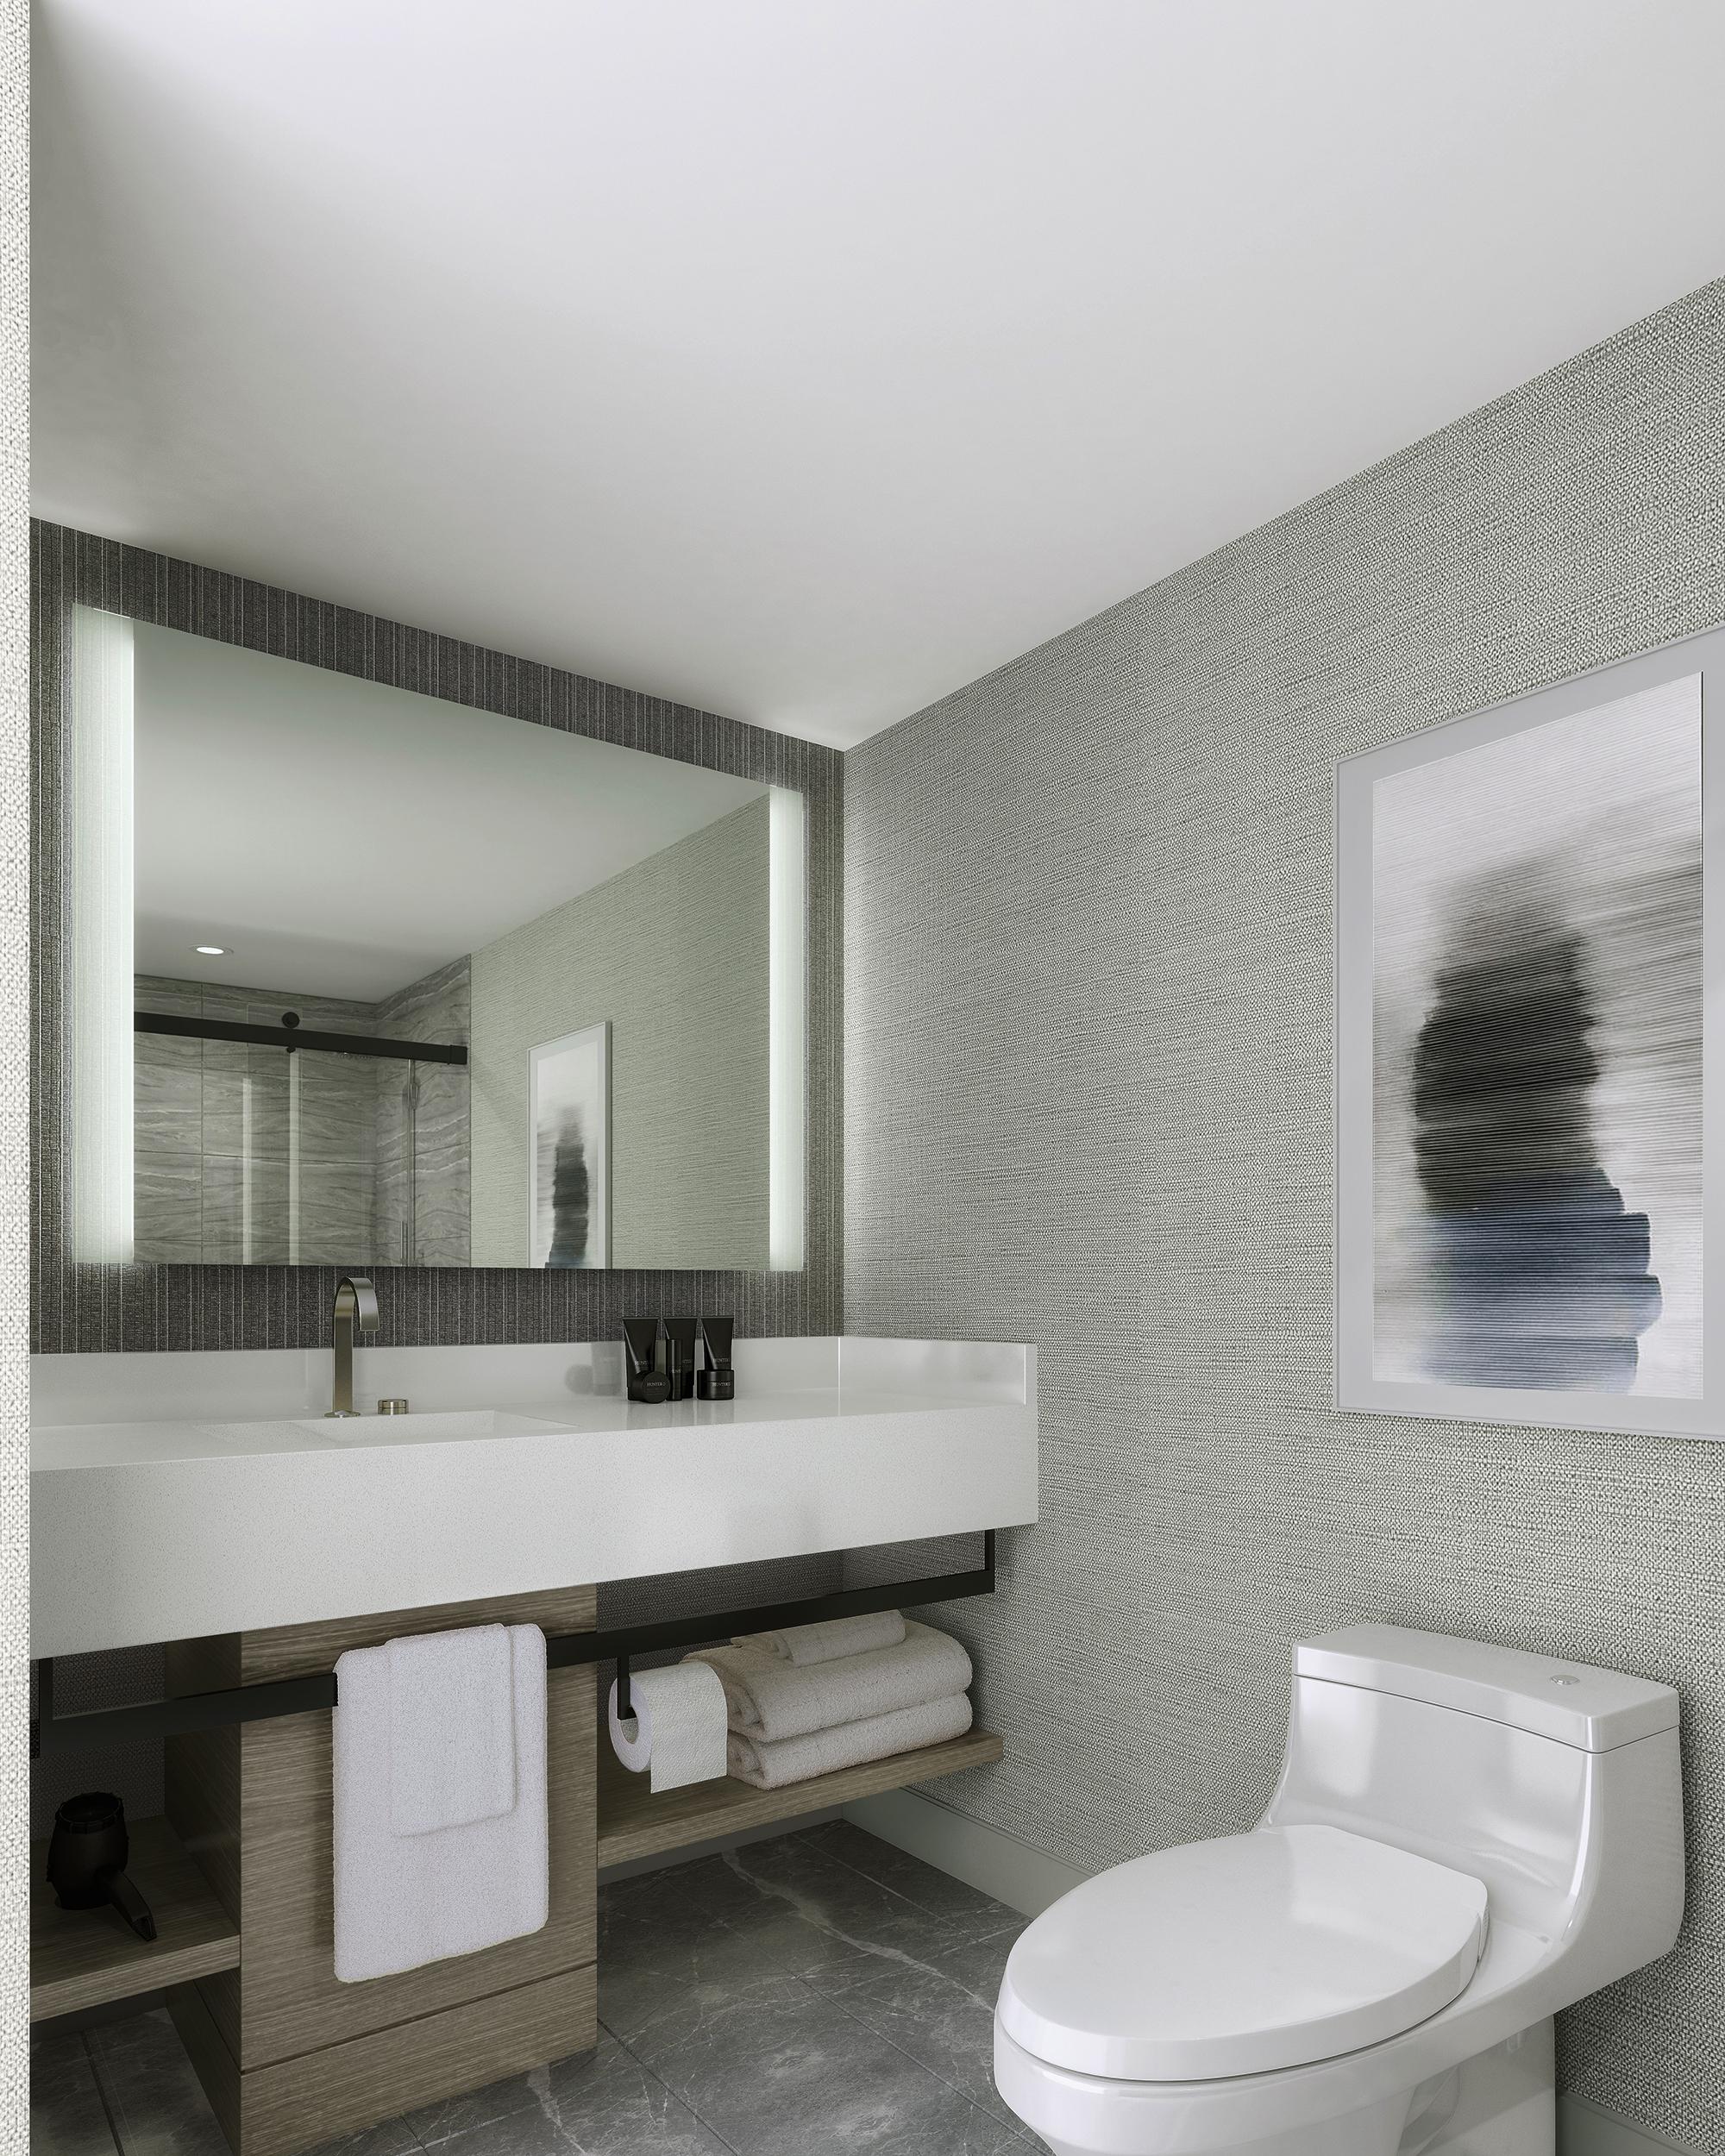 Bathroom inside Marriott Hotel in Ottawa